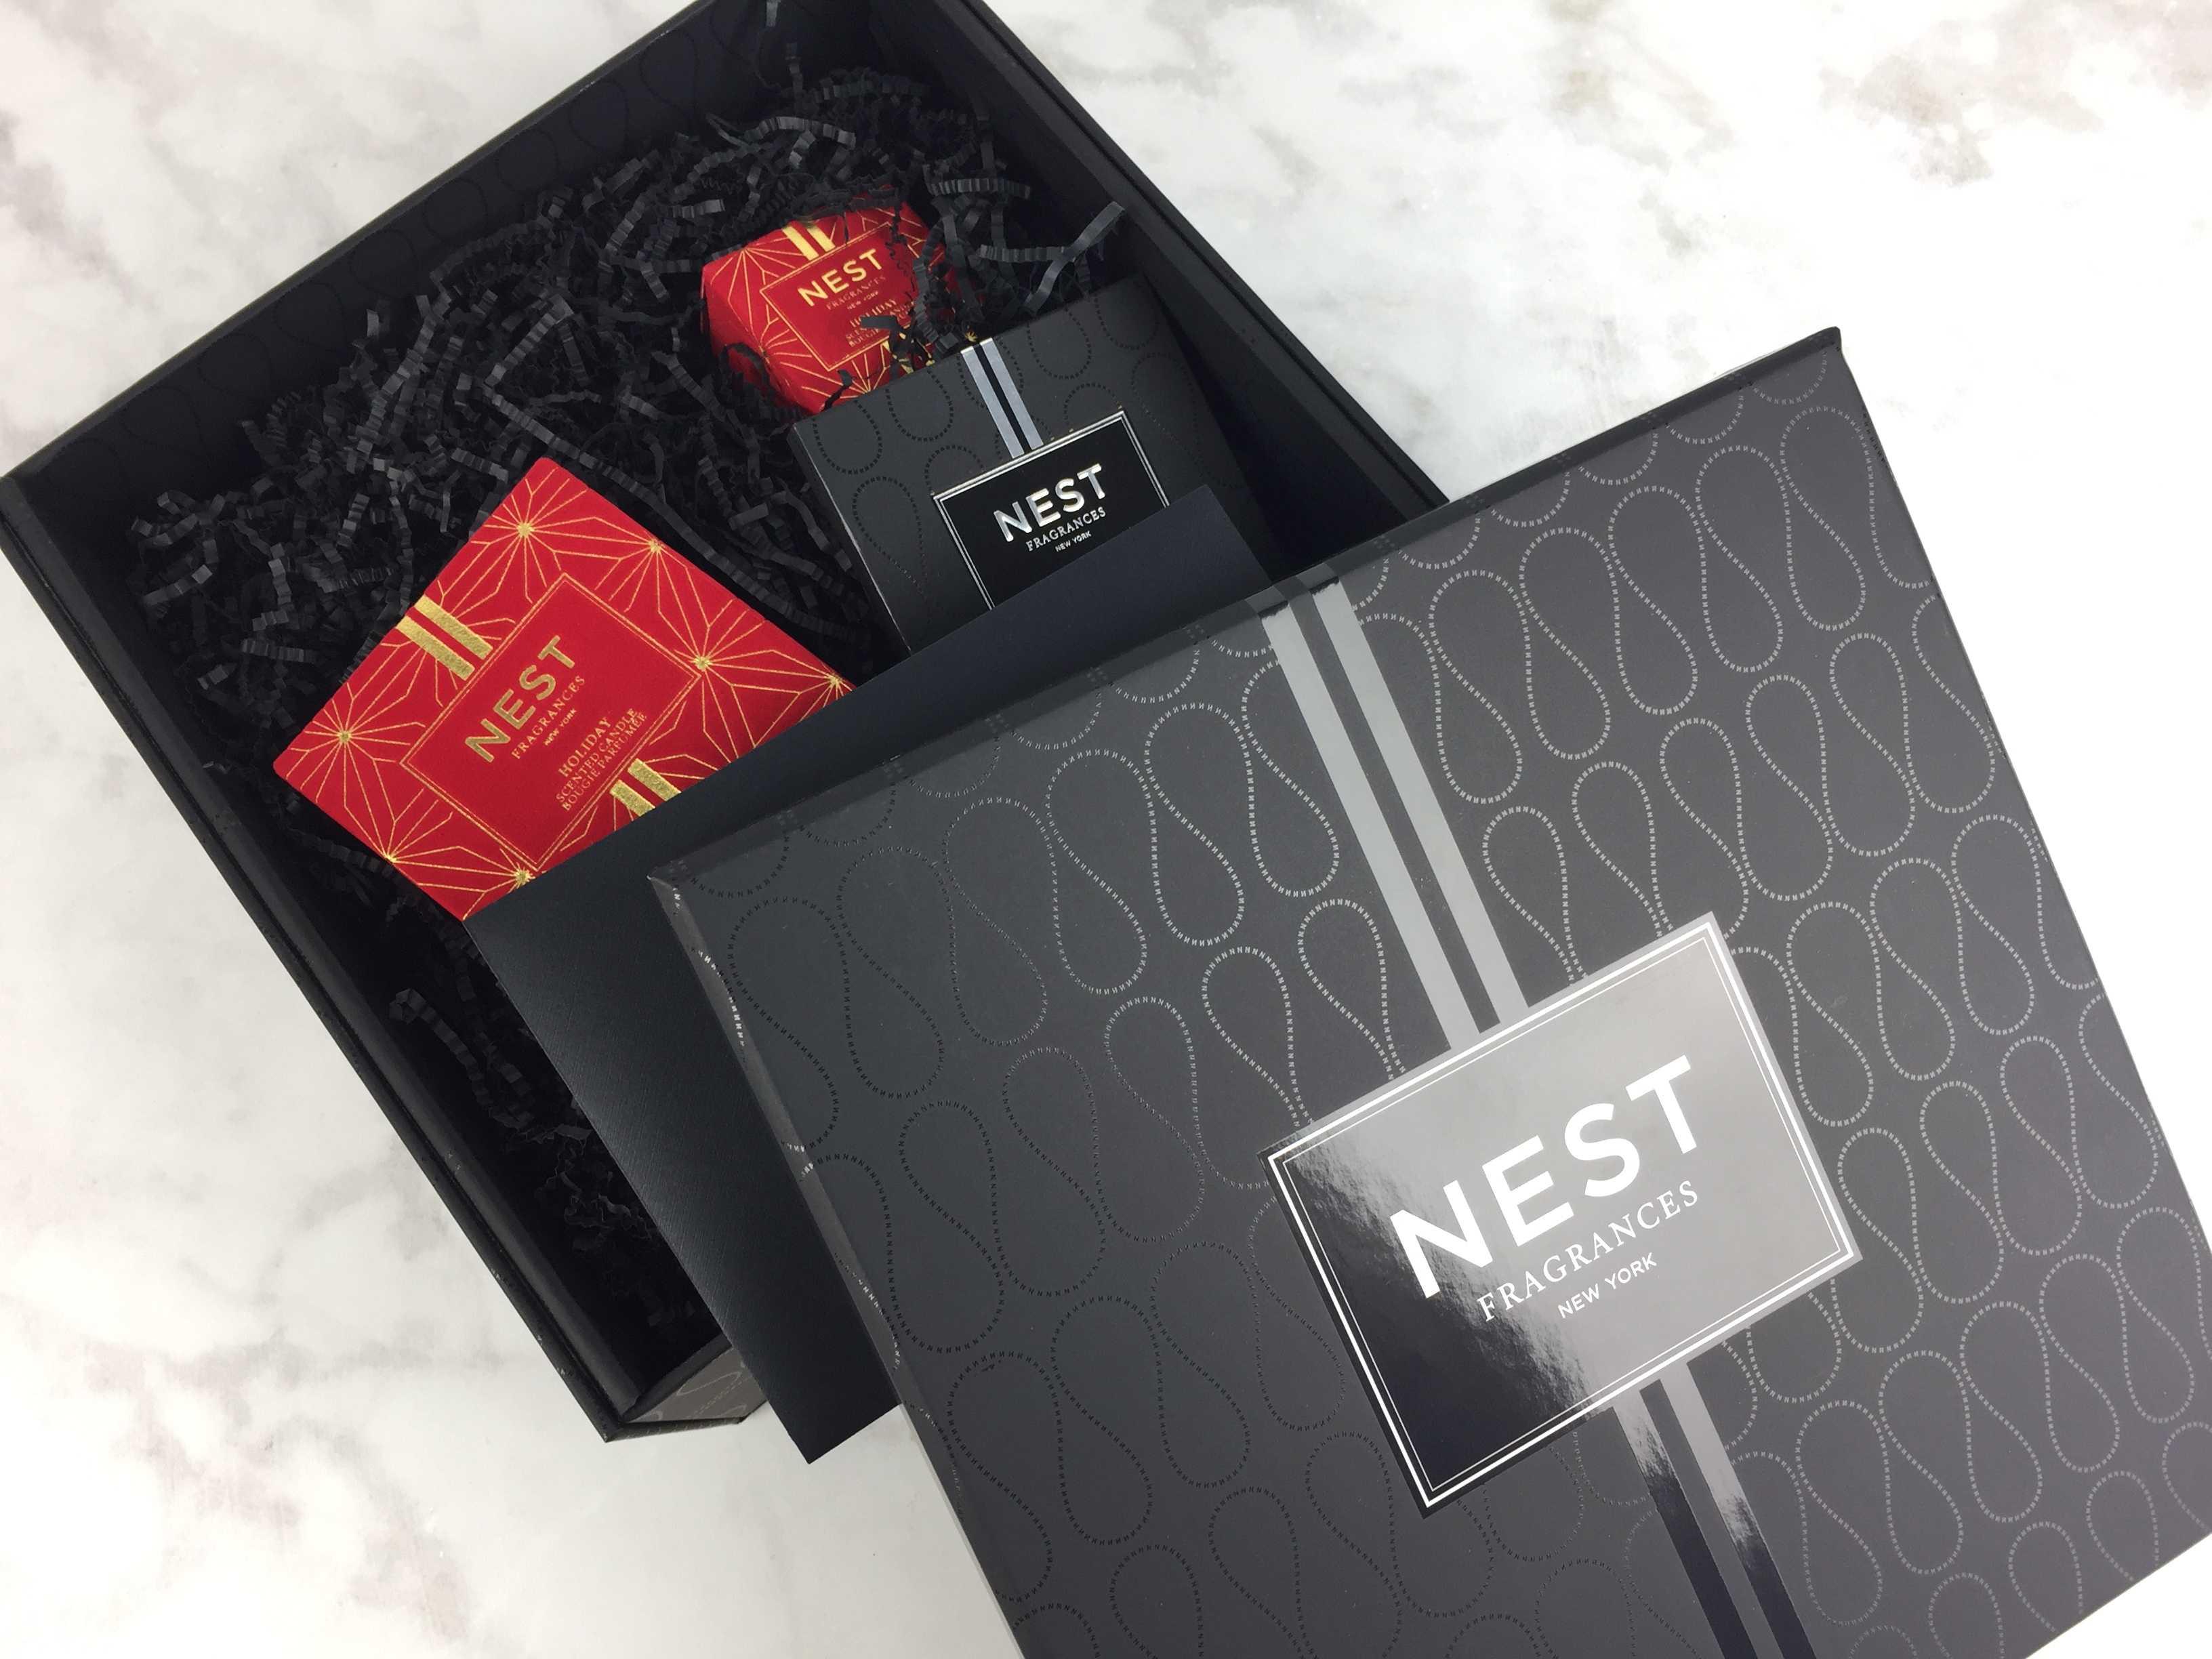 next-by-nest-fragrances-november-2016-unboxing